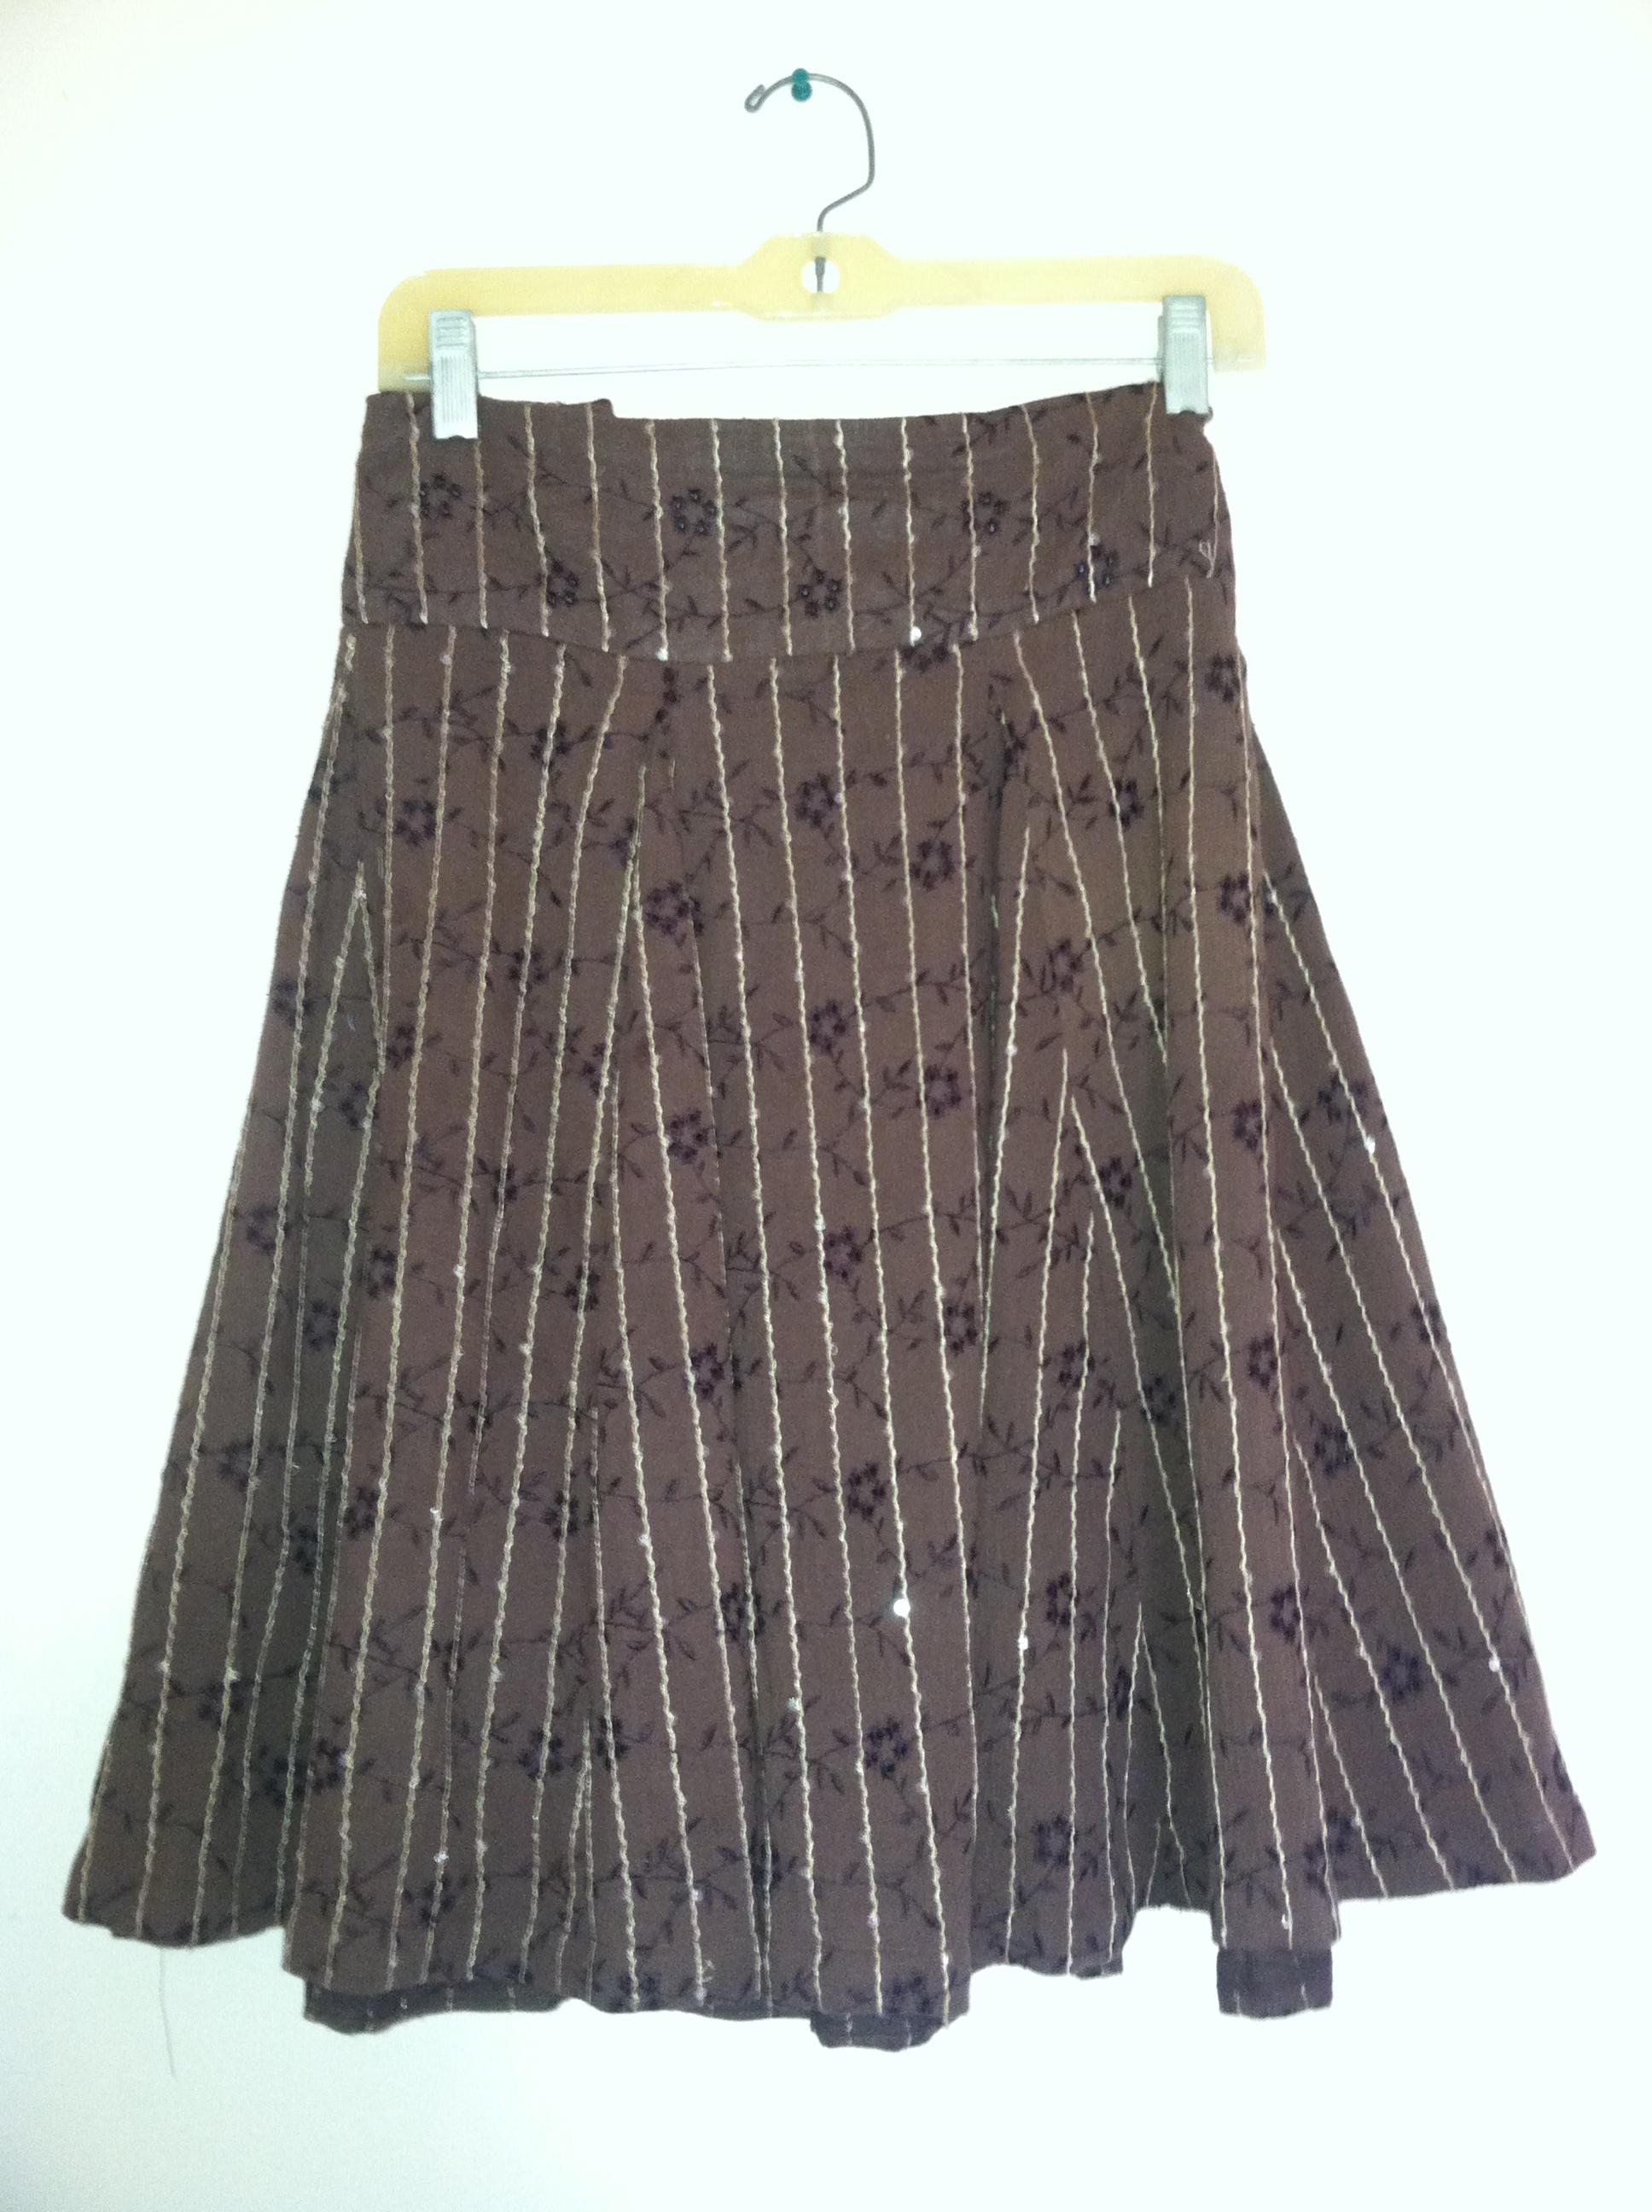 brown sparkly skirt.JPG